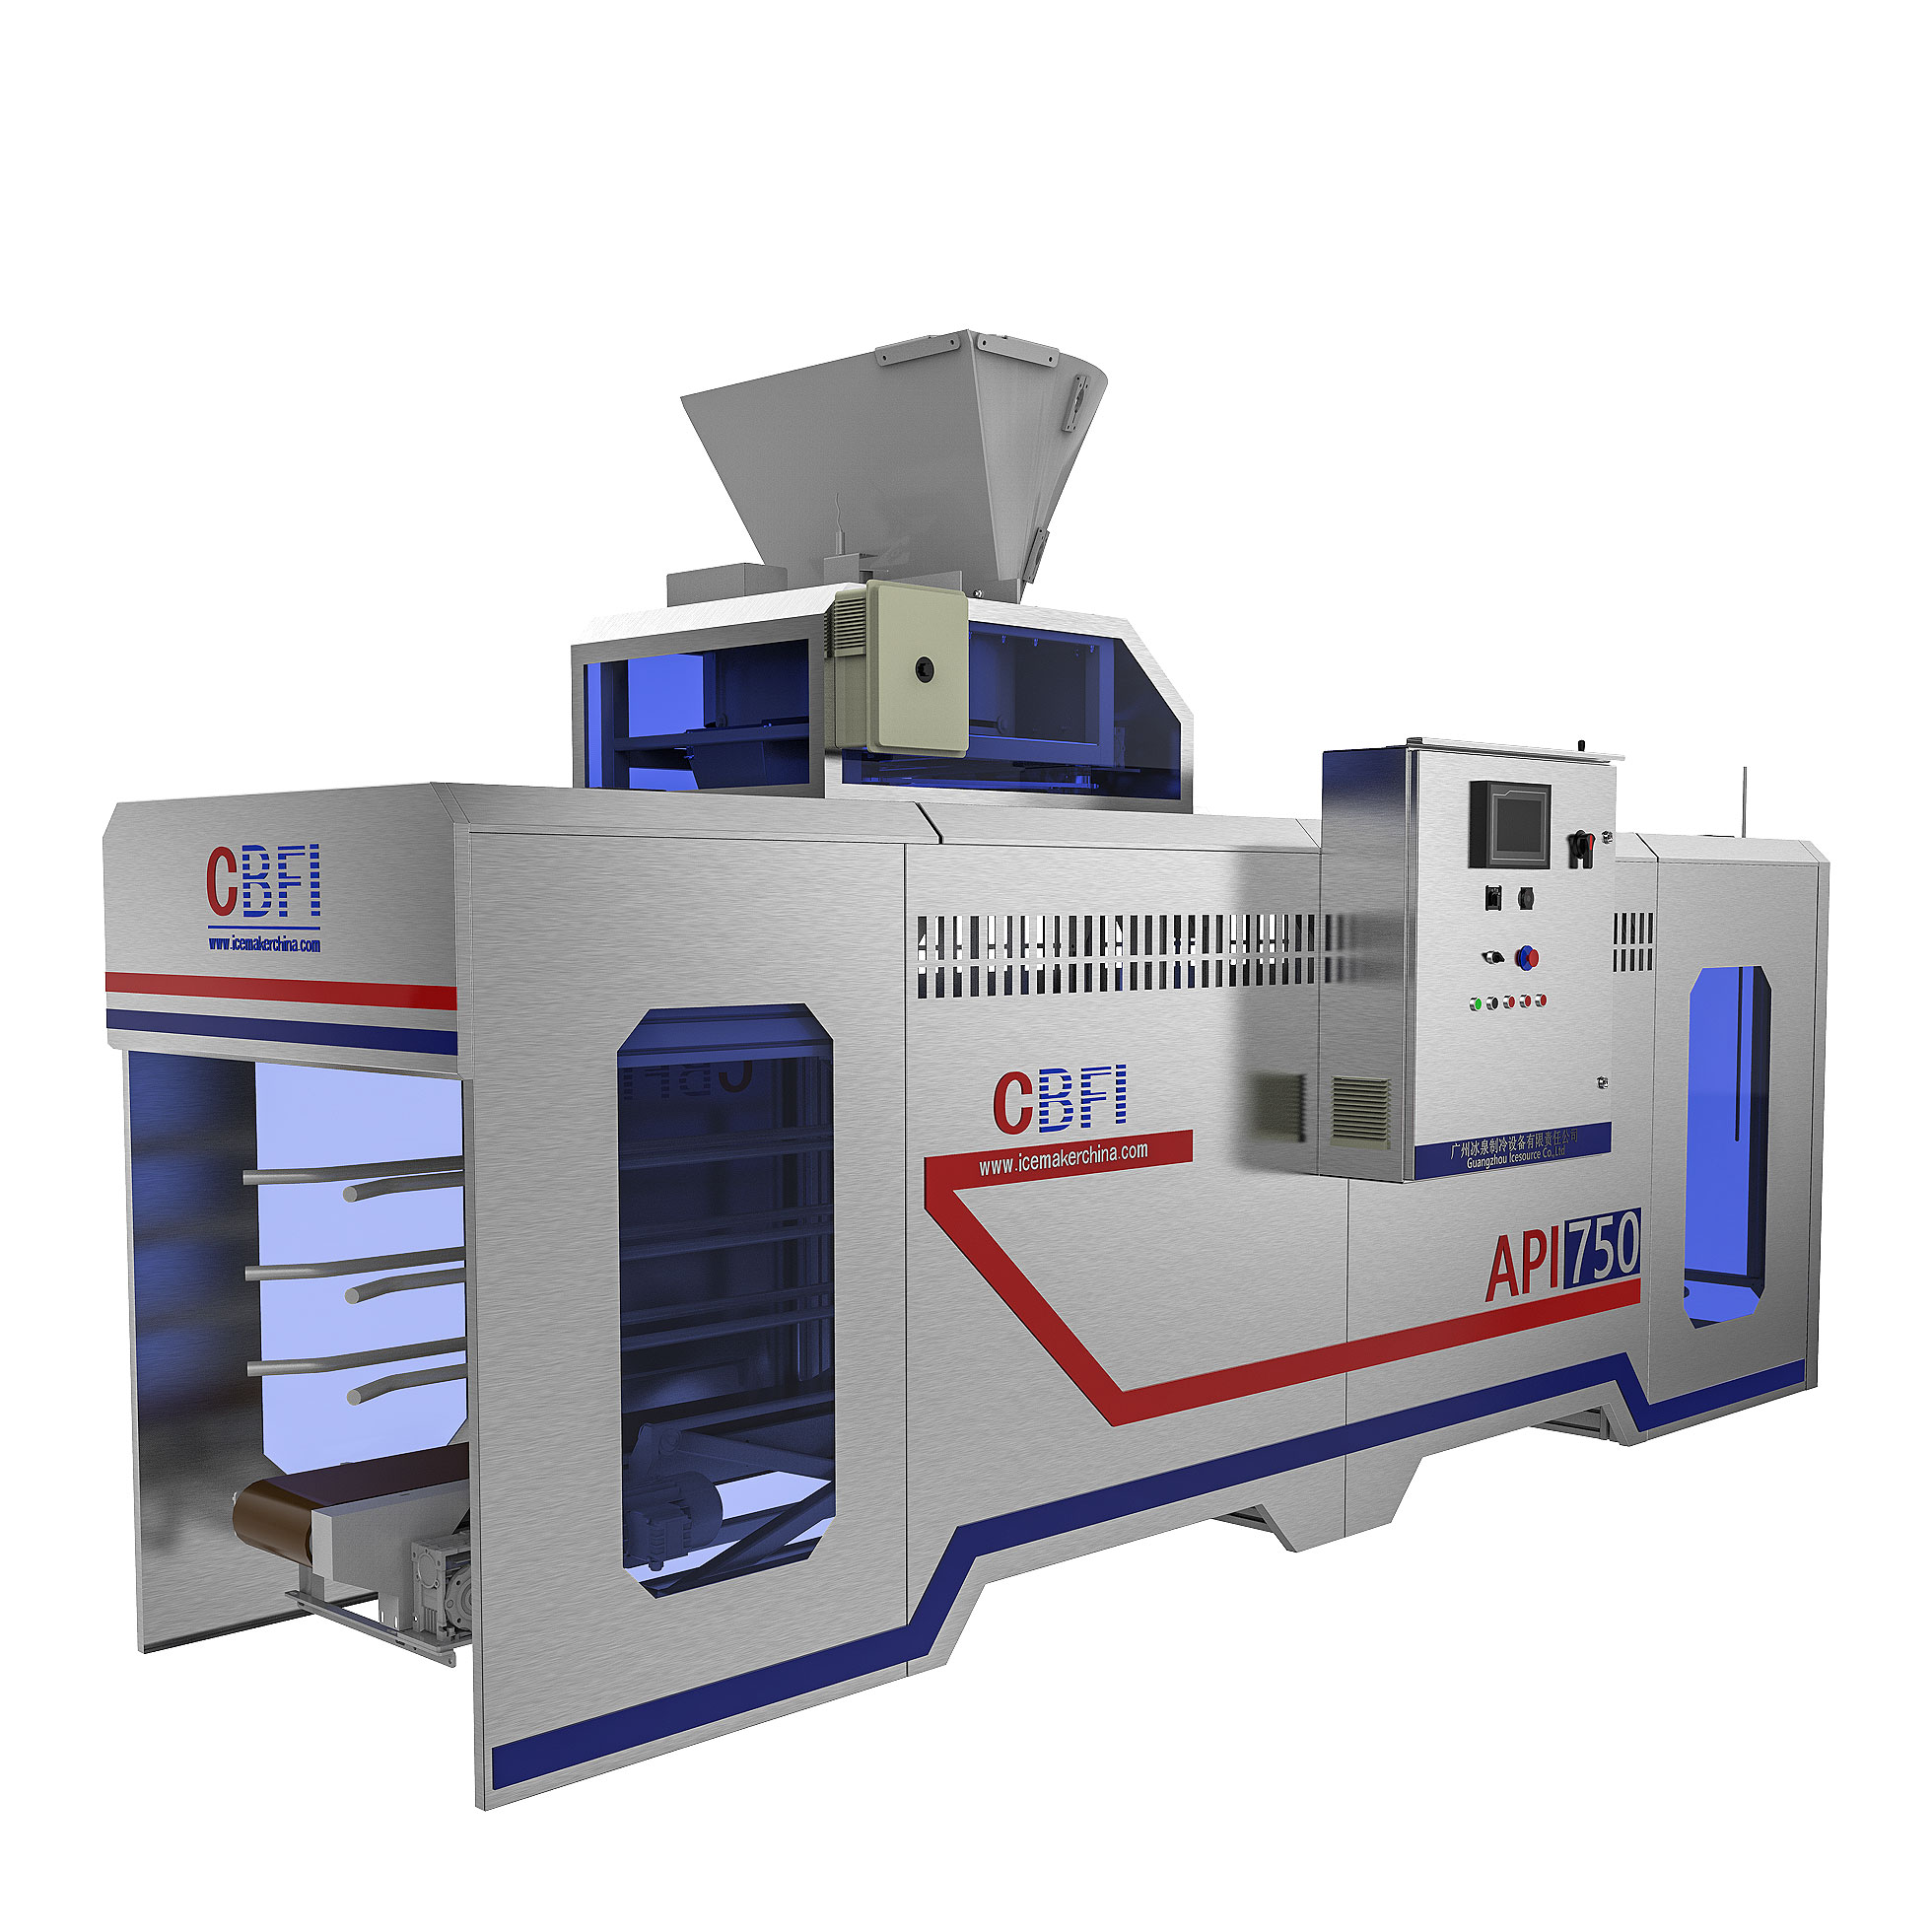 CBFI-Large Cube Ice Maker   Cbfi Cv10000 10 Tons Per Day Cube Ice Maker With-7